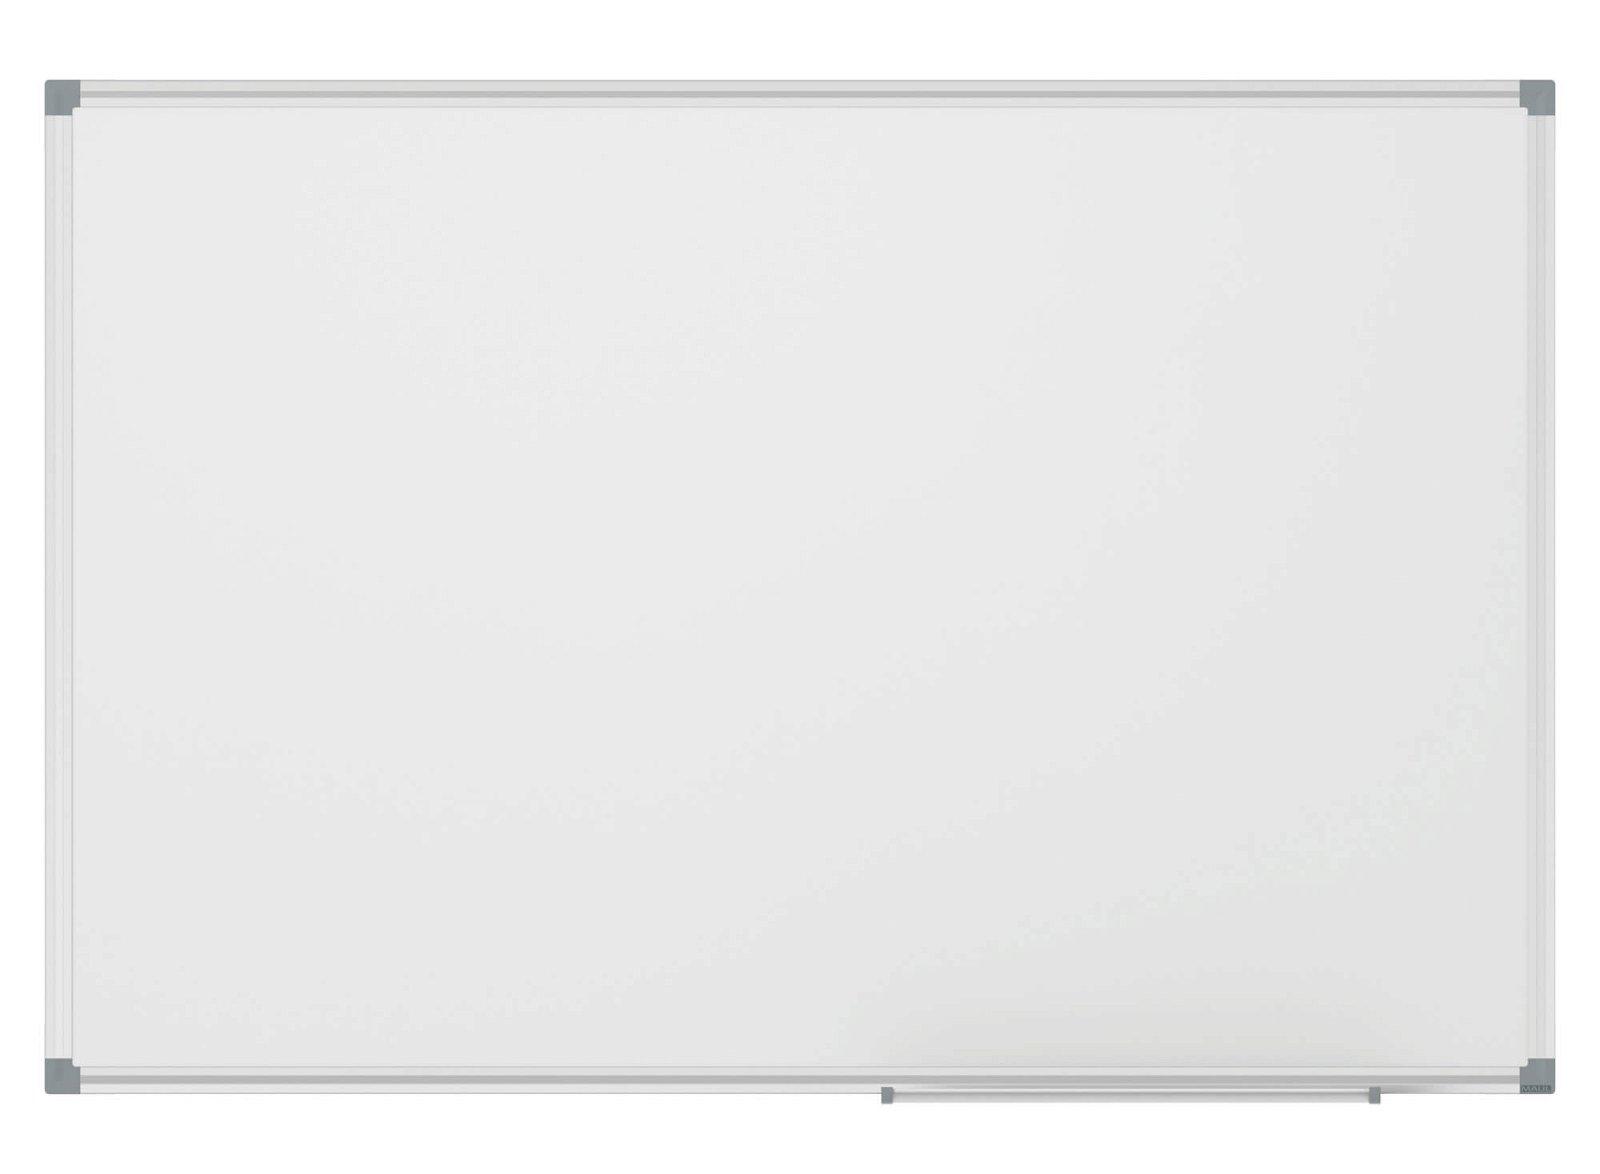 Whiteboard MAULstandard, Emaille, 120x300 cm, grau